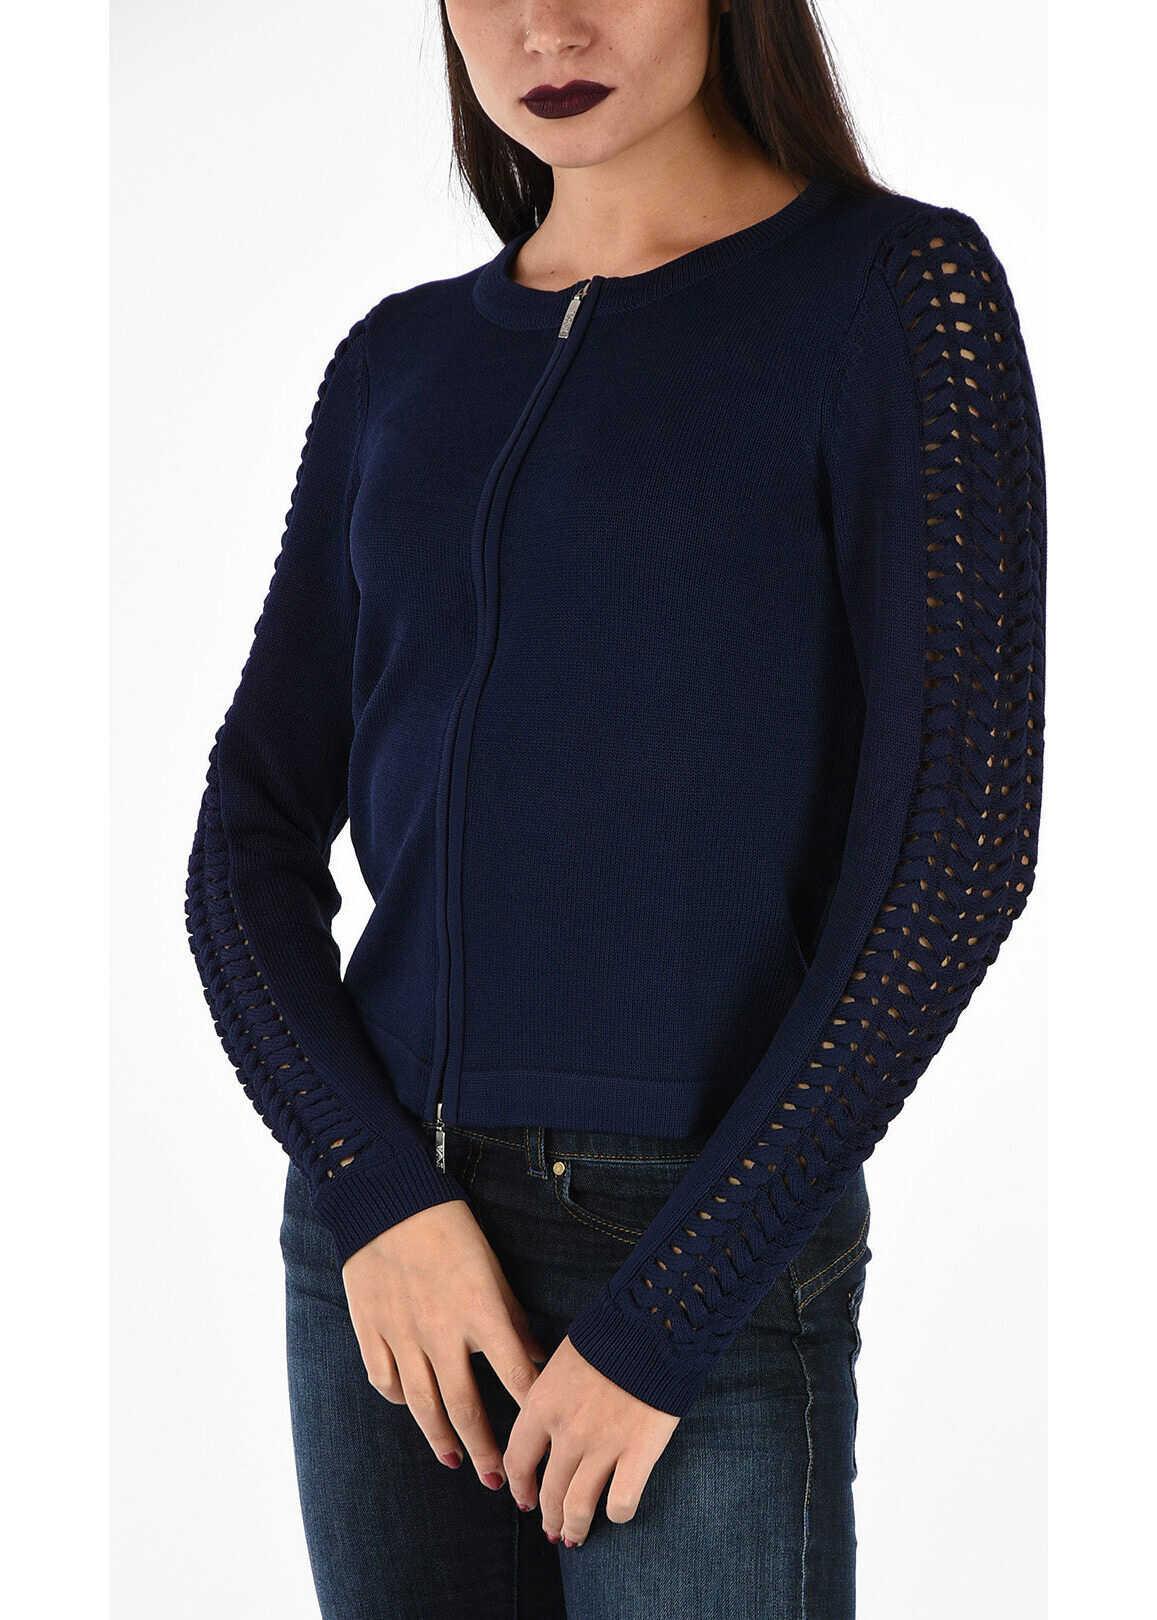 Armani EMPORIO Zipped Cardigan BLUE